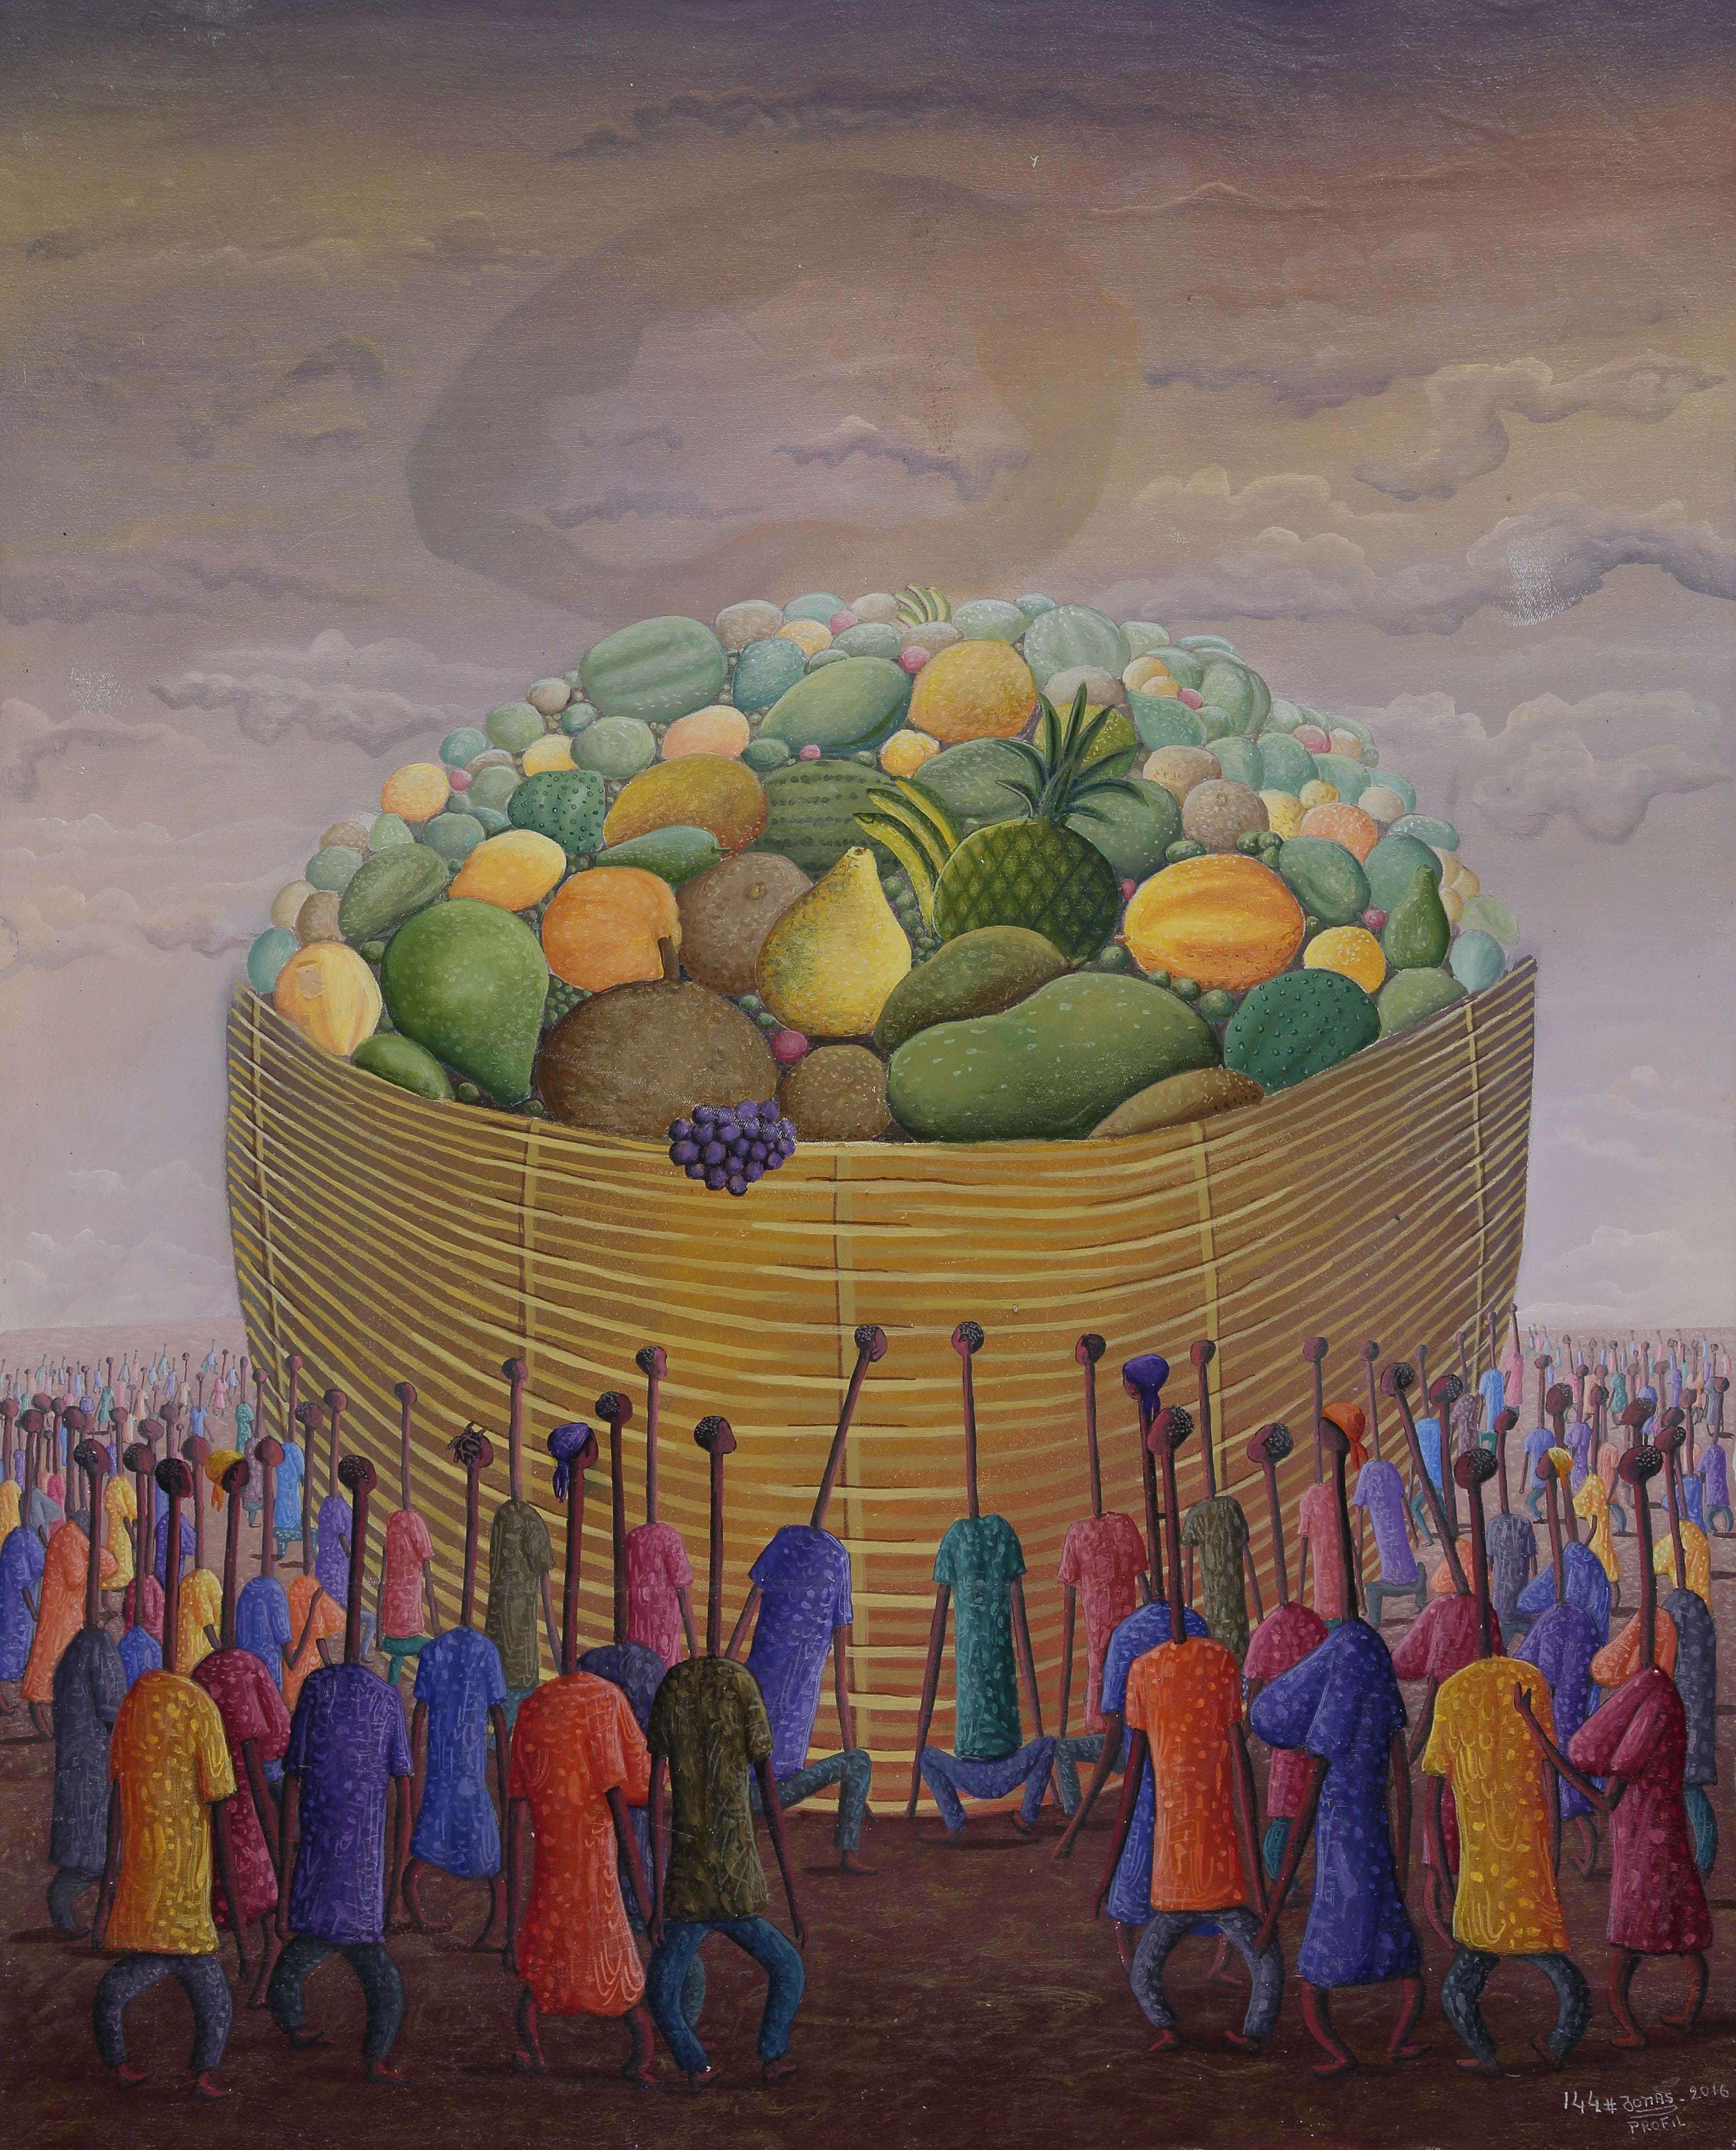 Unity gives fruits